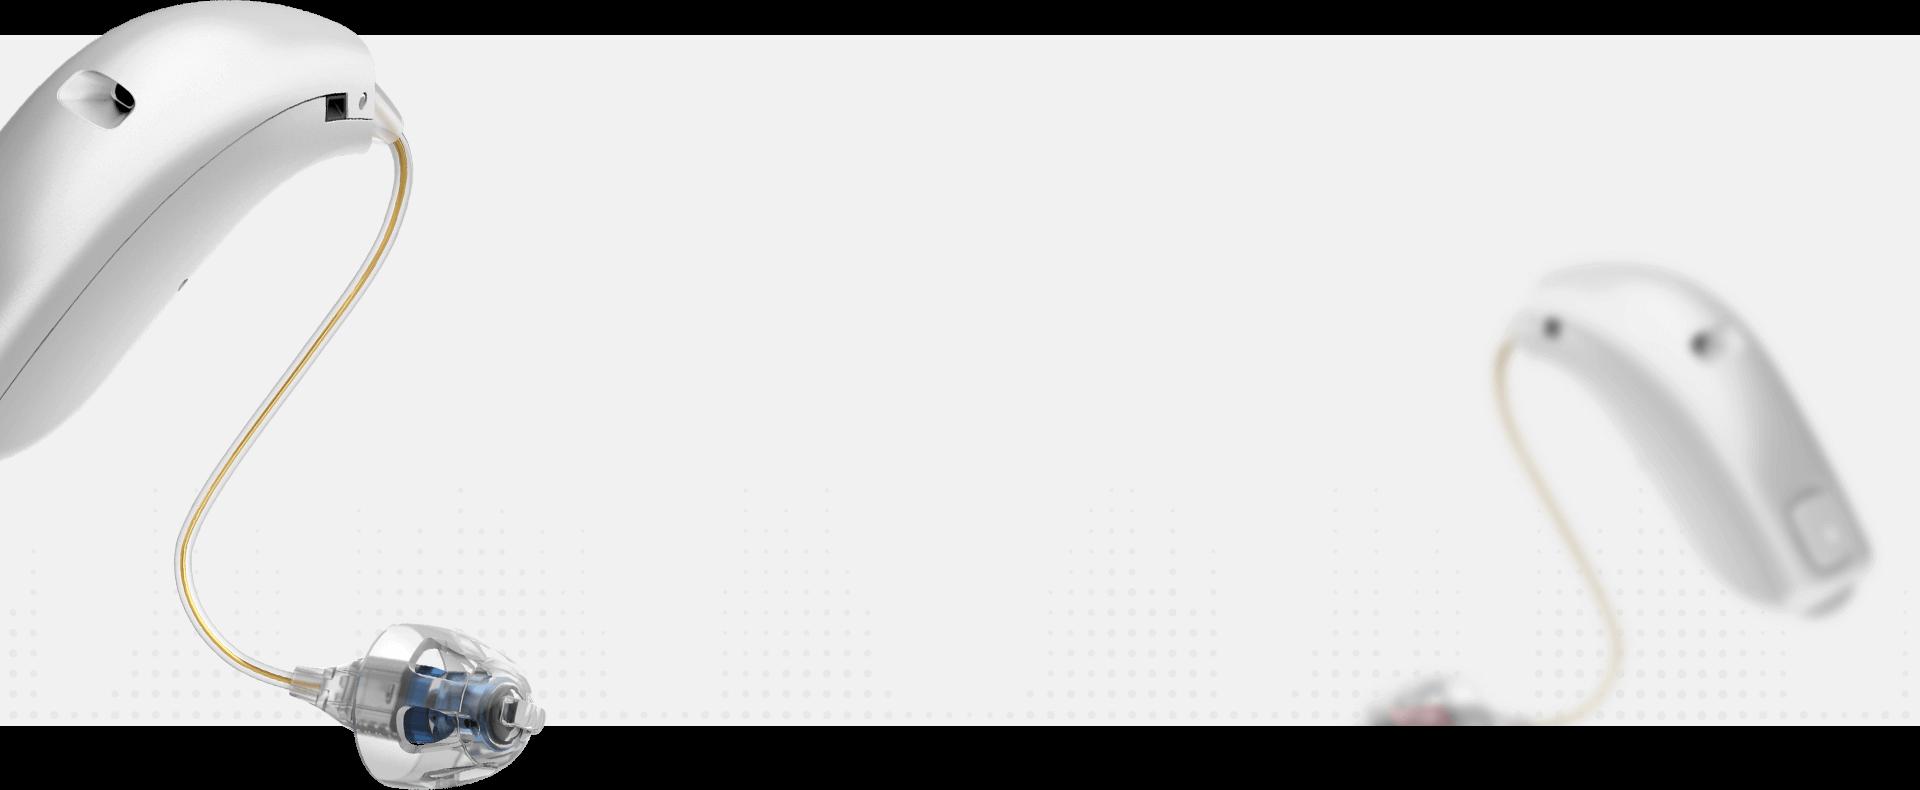 deux appareils auditifs Oticon Opn en blanc